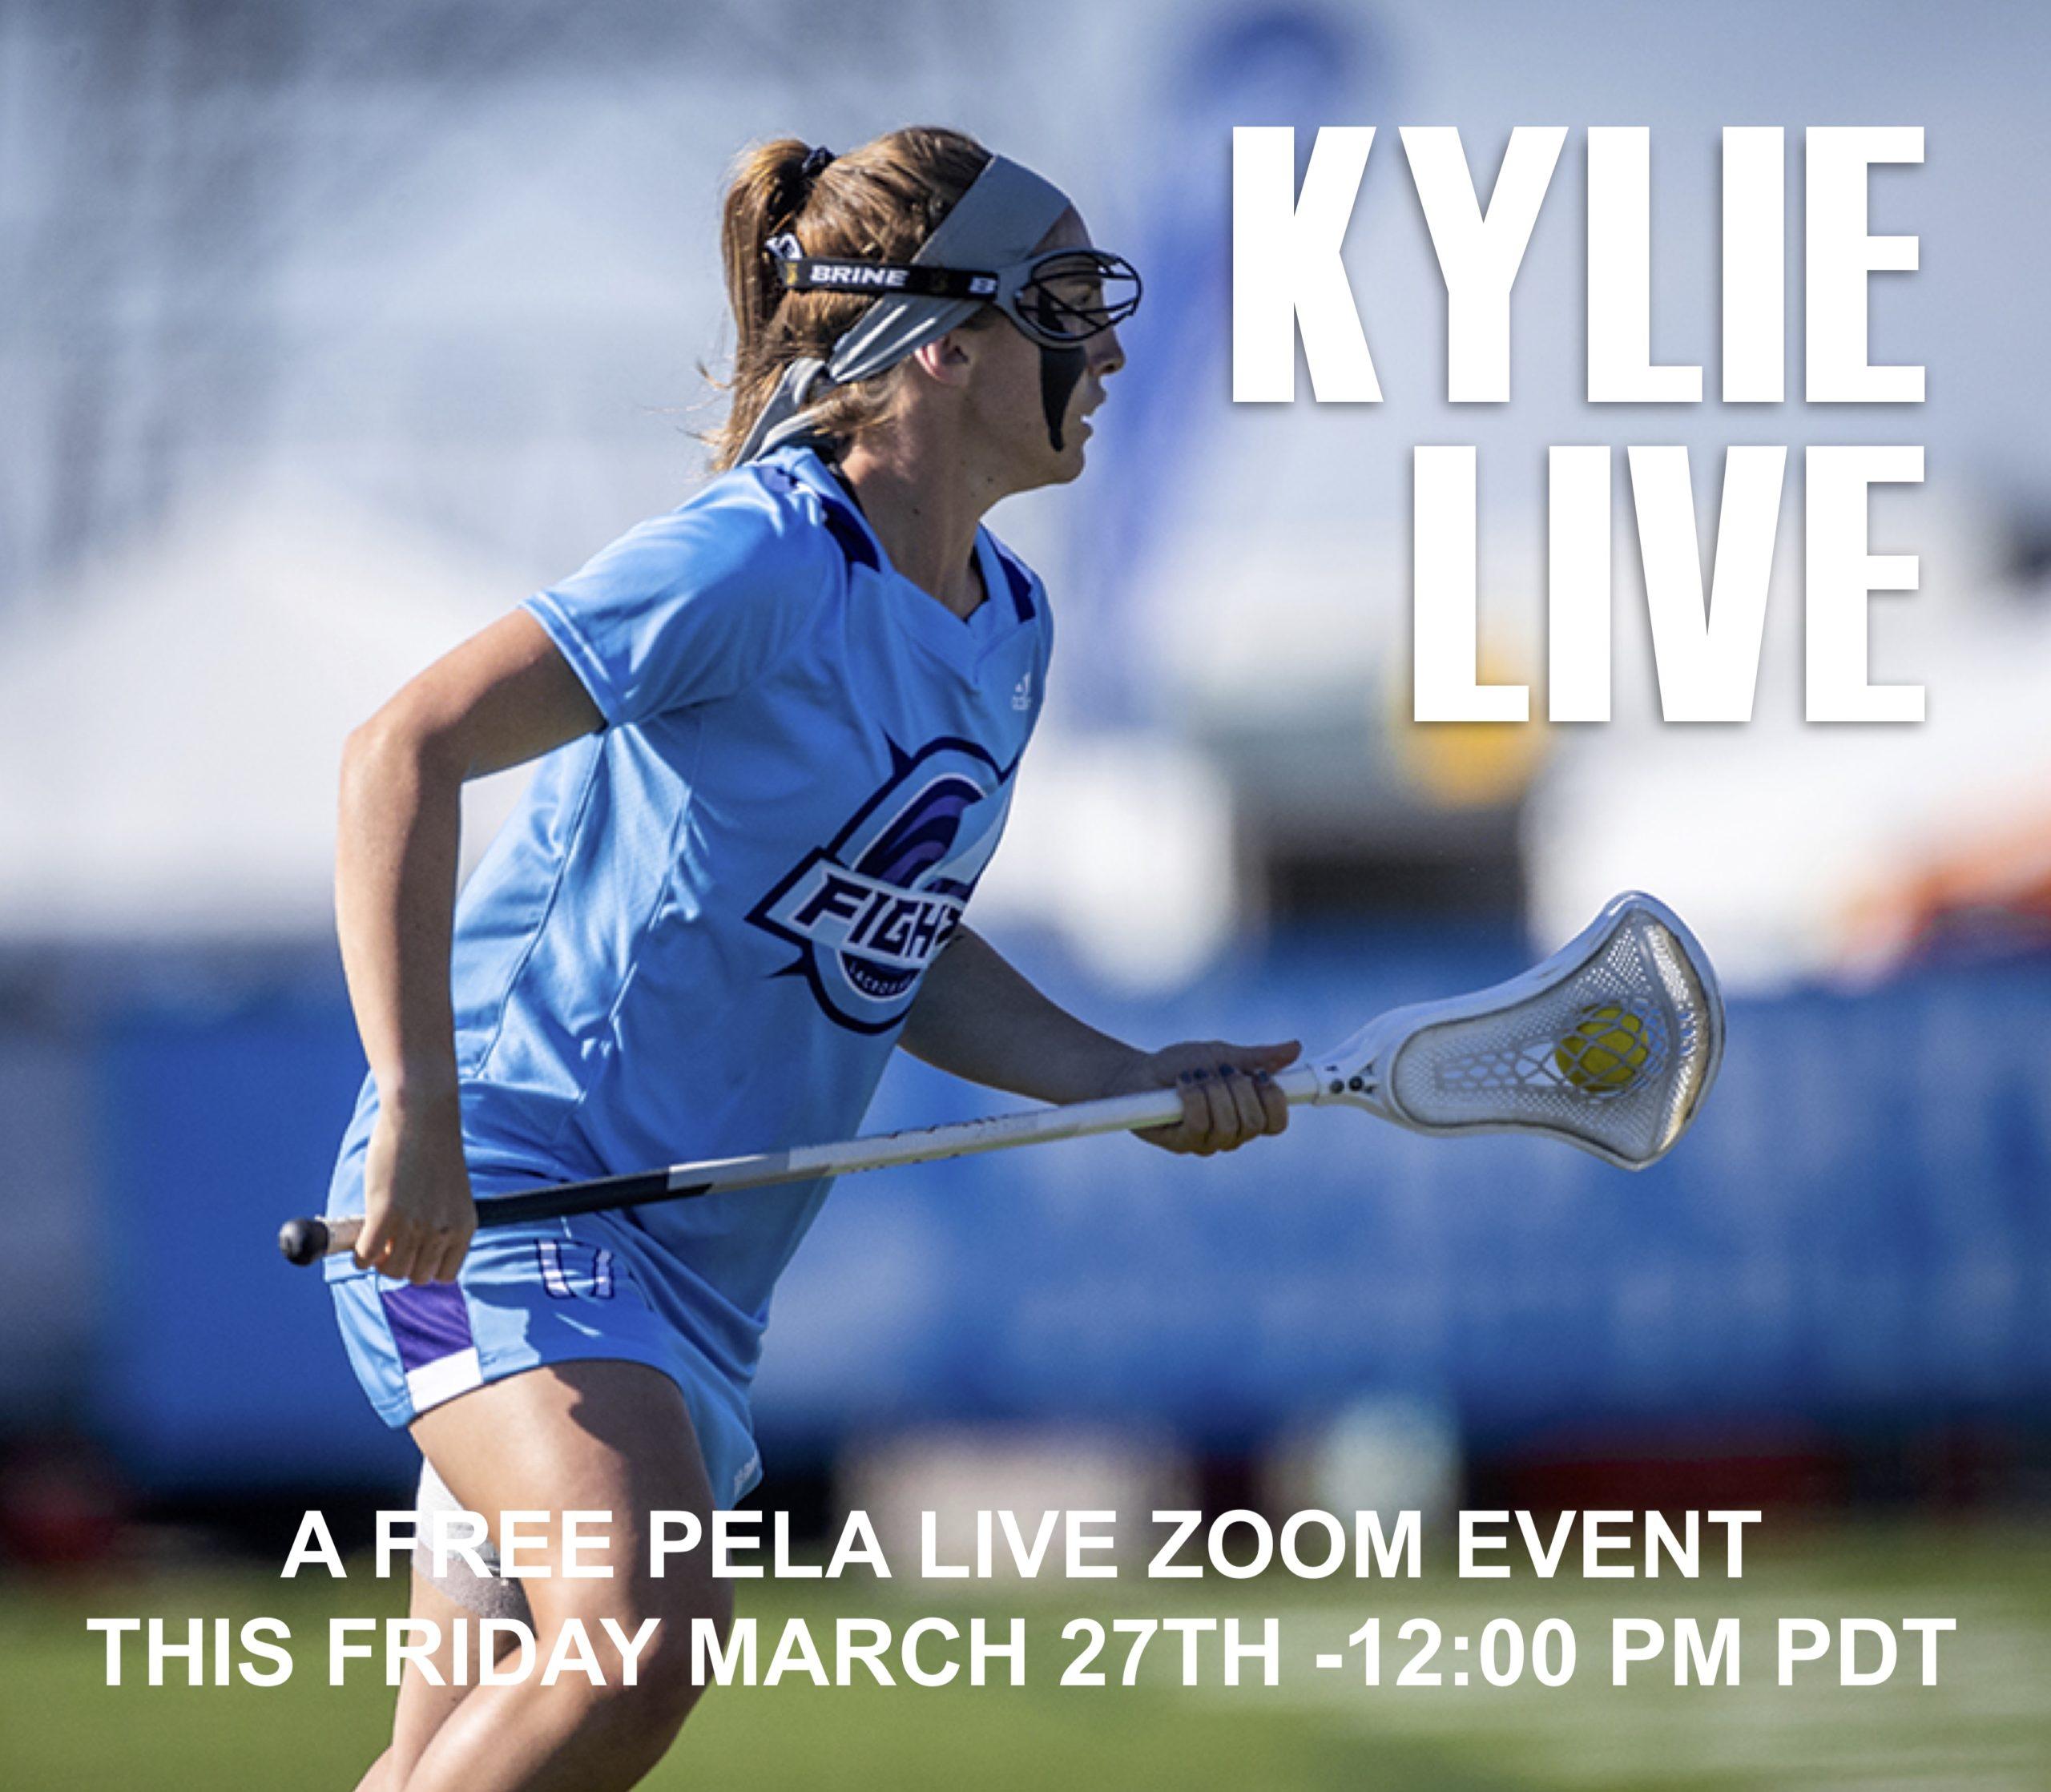 KYLIE LIVE 2 copy